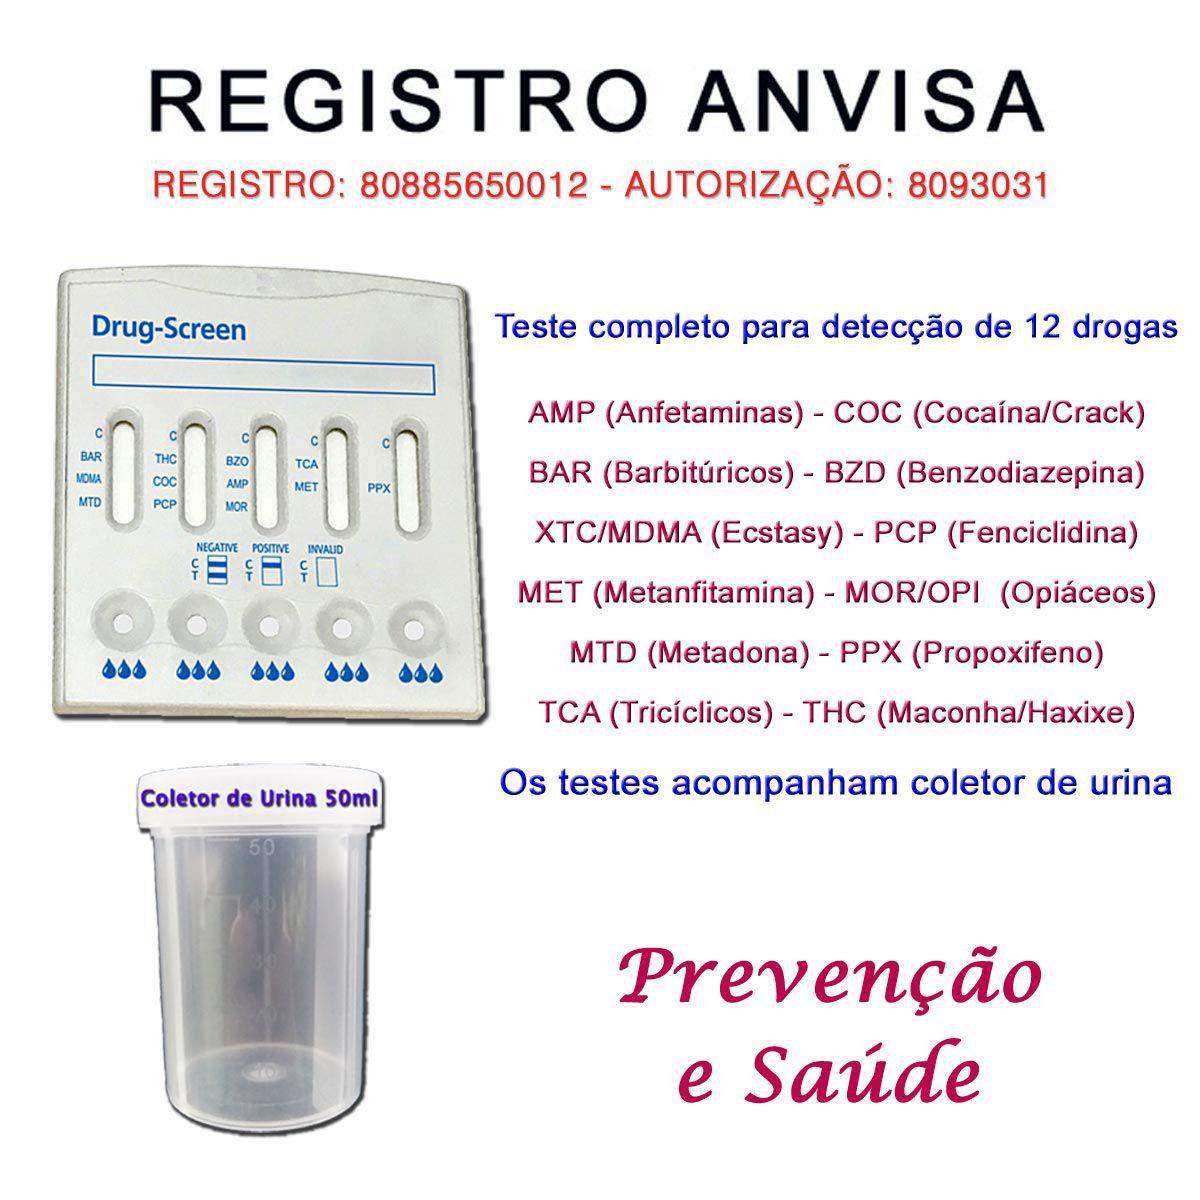 05 Kits para testes de 12 substâncias  - Testes Para Drogas e Parar de Beber e Fumar